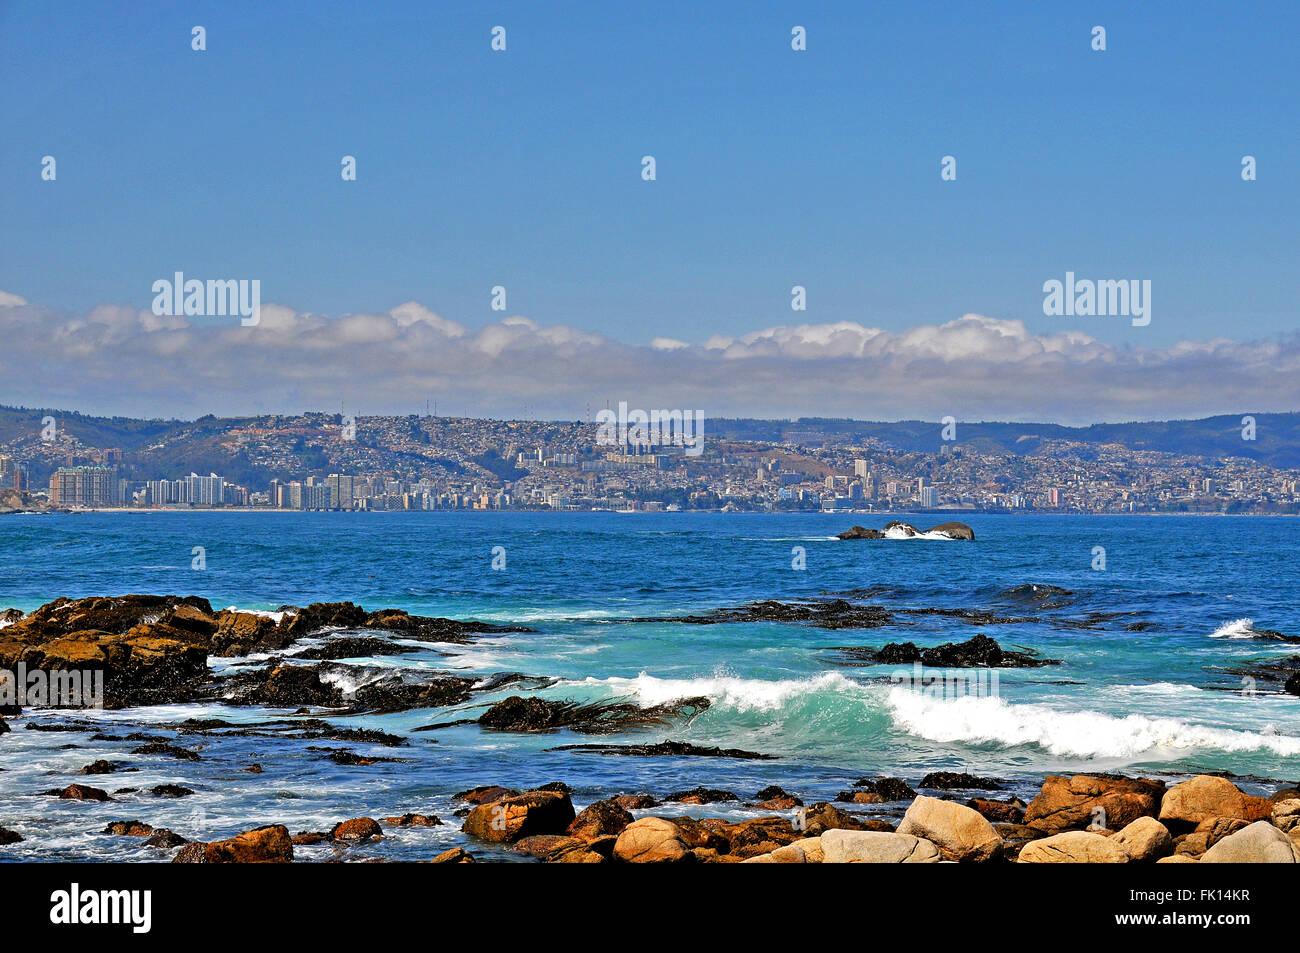 Pacific ocean coastline with in background Vina del Mar and Valparaiso Chile Stock Photo